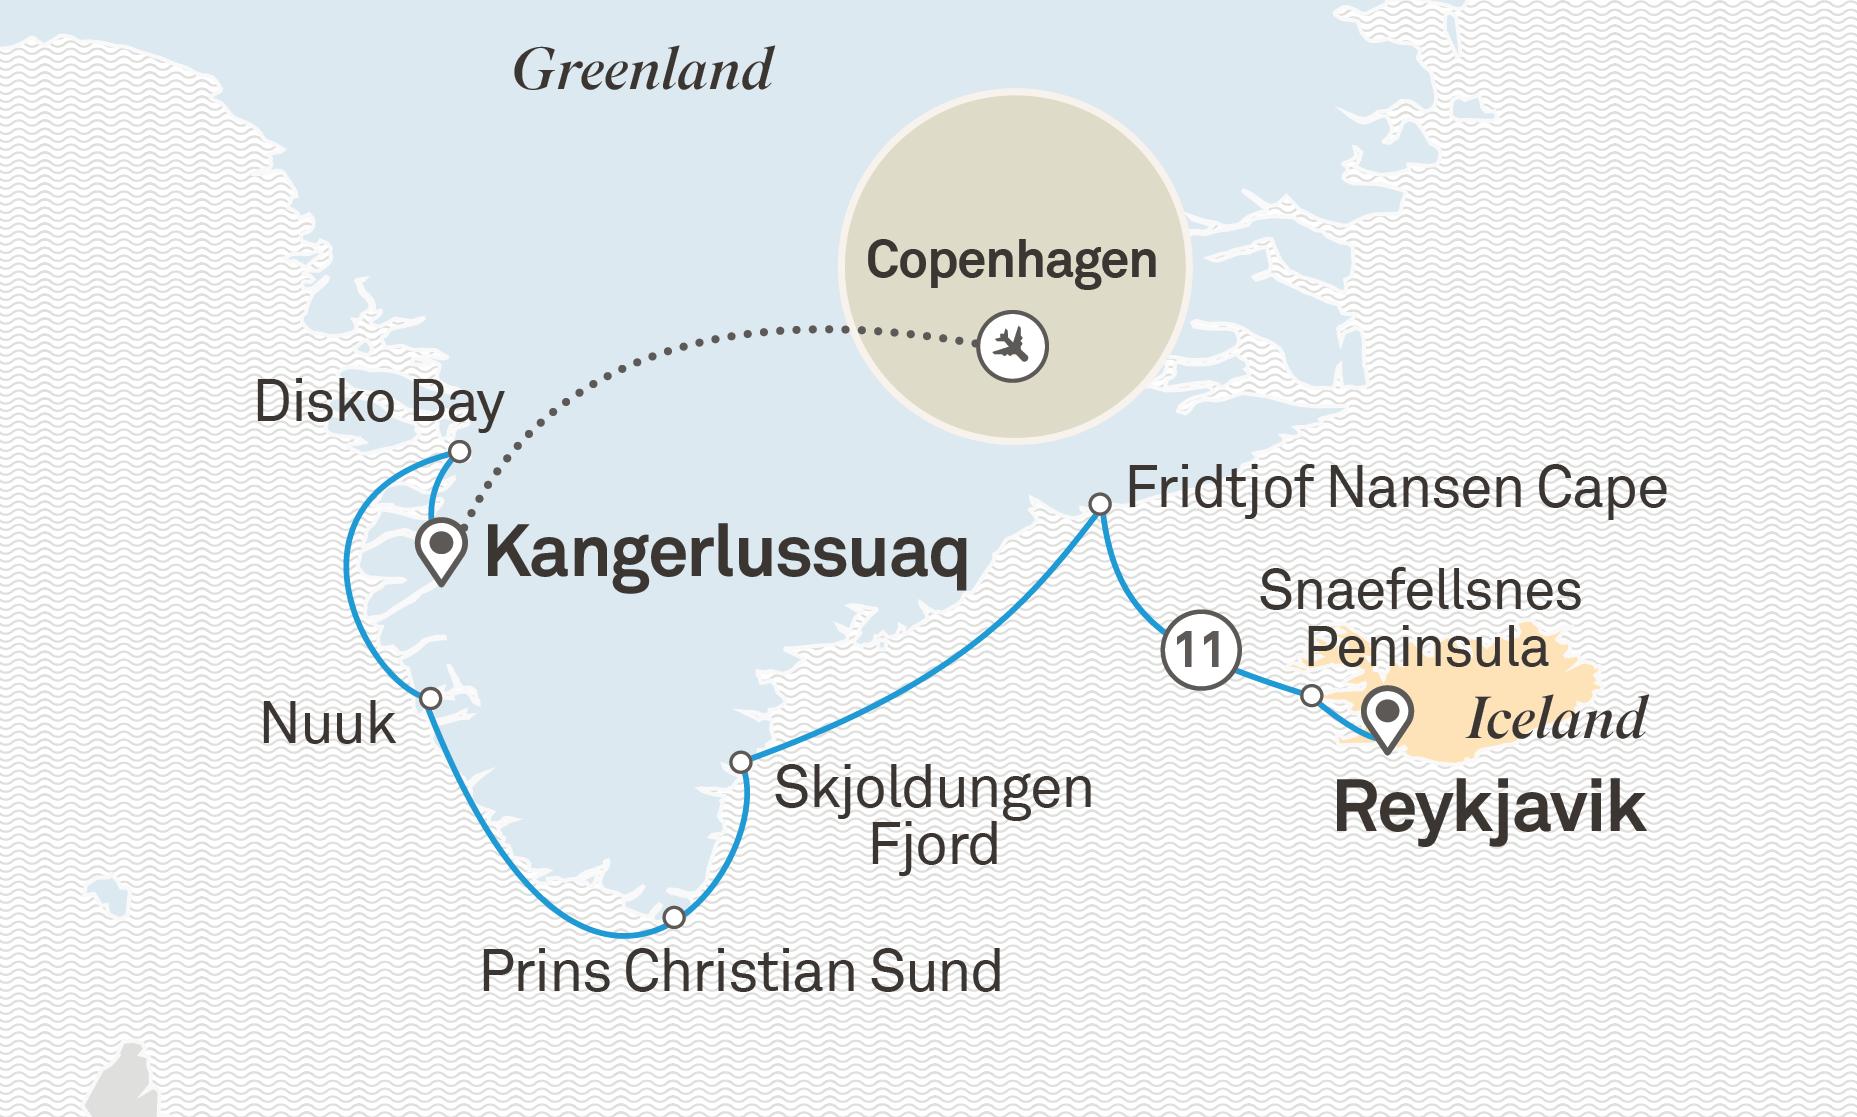 Scenic Cruises - Iceland & Greenland Explorer